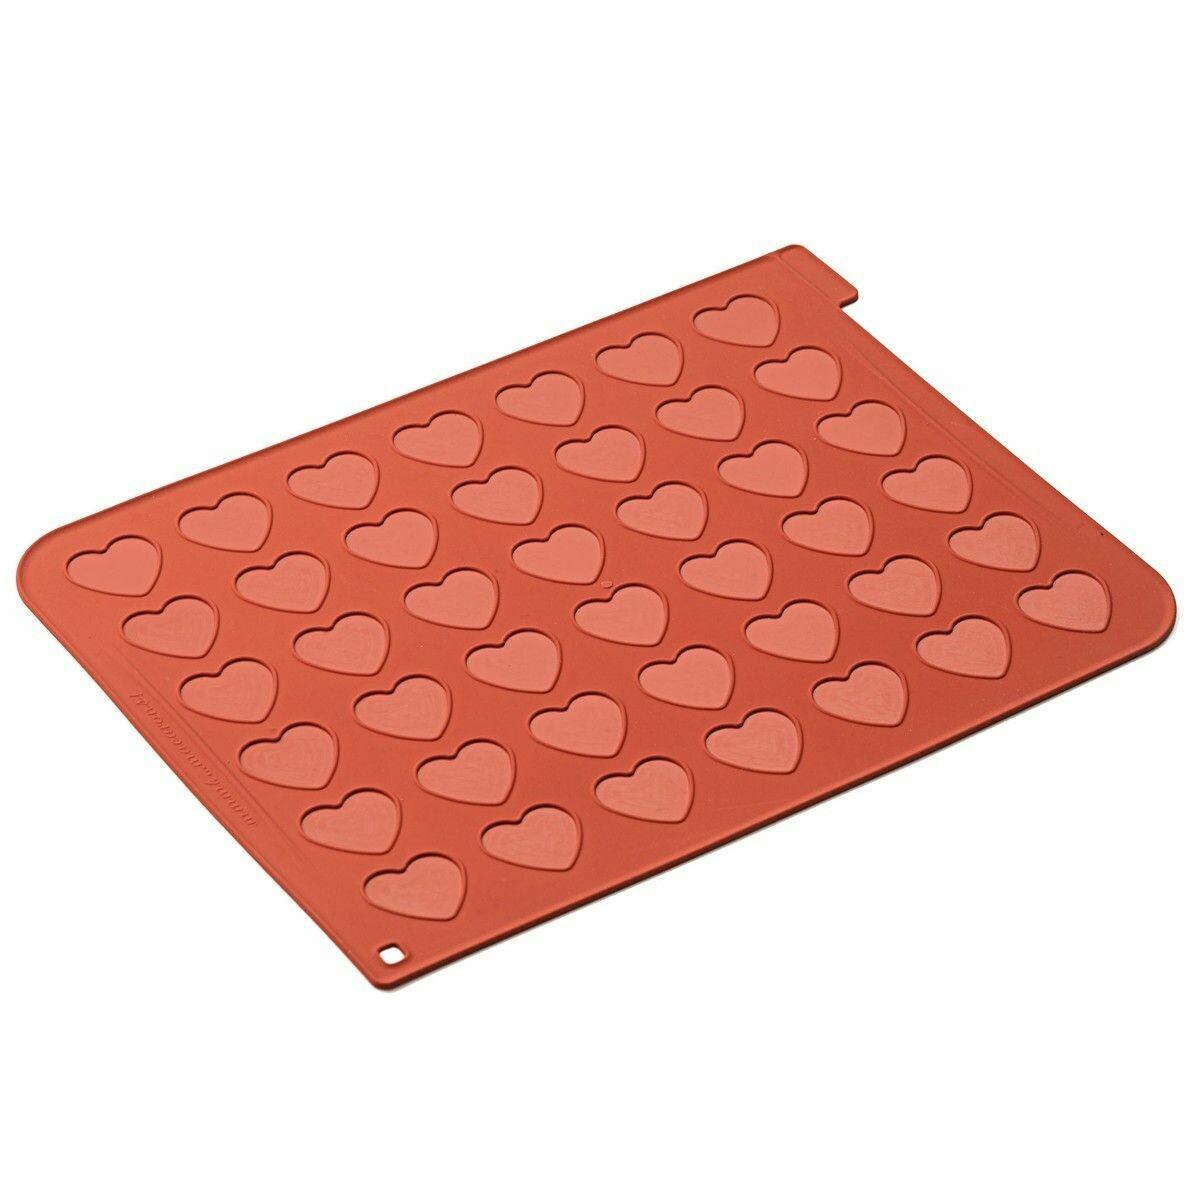 Silikomart -Macaron Baking Mat -HEART - Πατάκι Ψησίματος Μακαρόν με 42 Ισομερείς Καρδιές